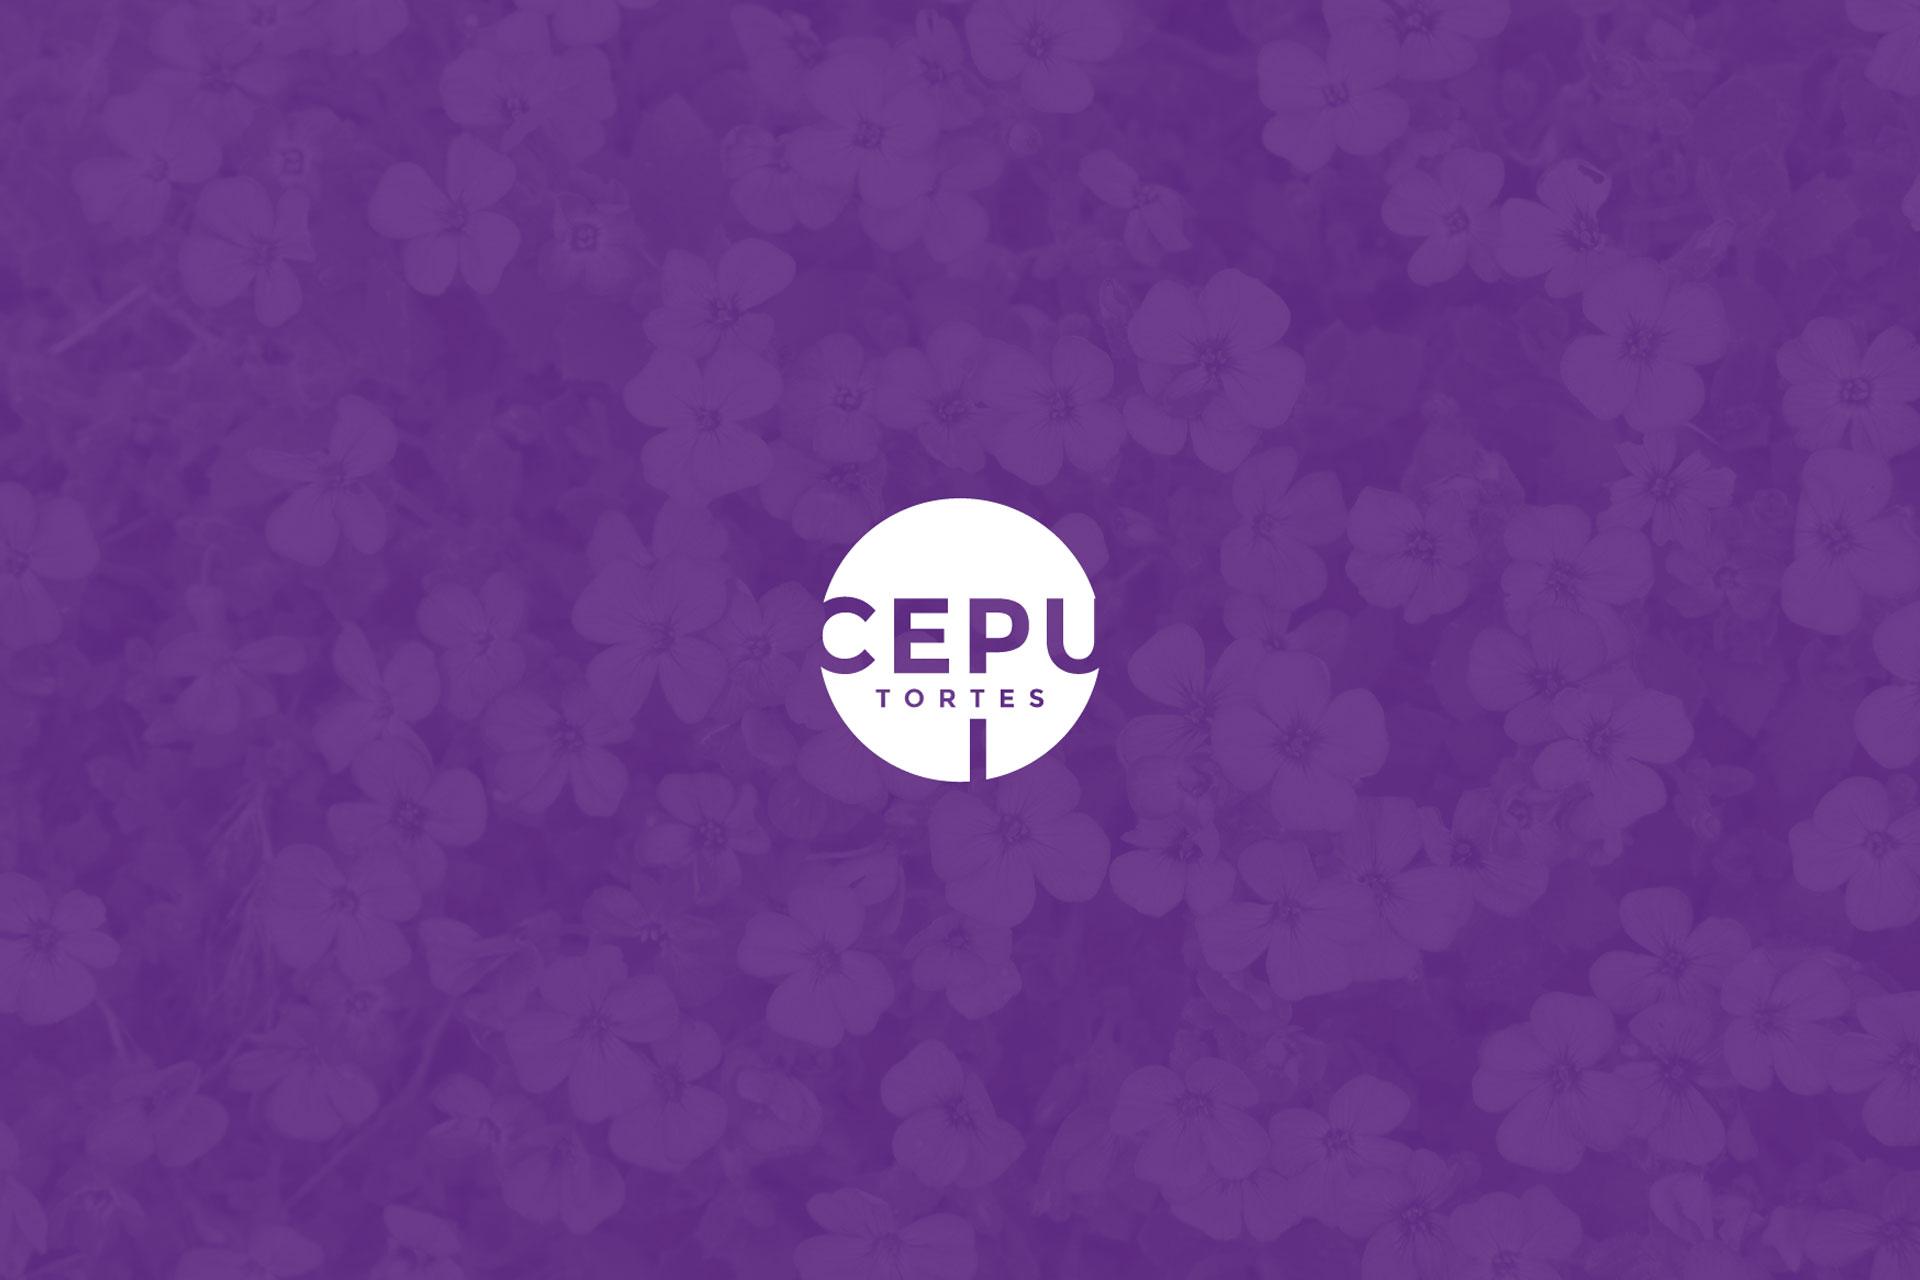 Ceputortes.lv logotipa dizaina izstrāde